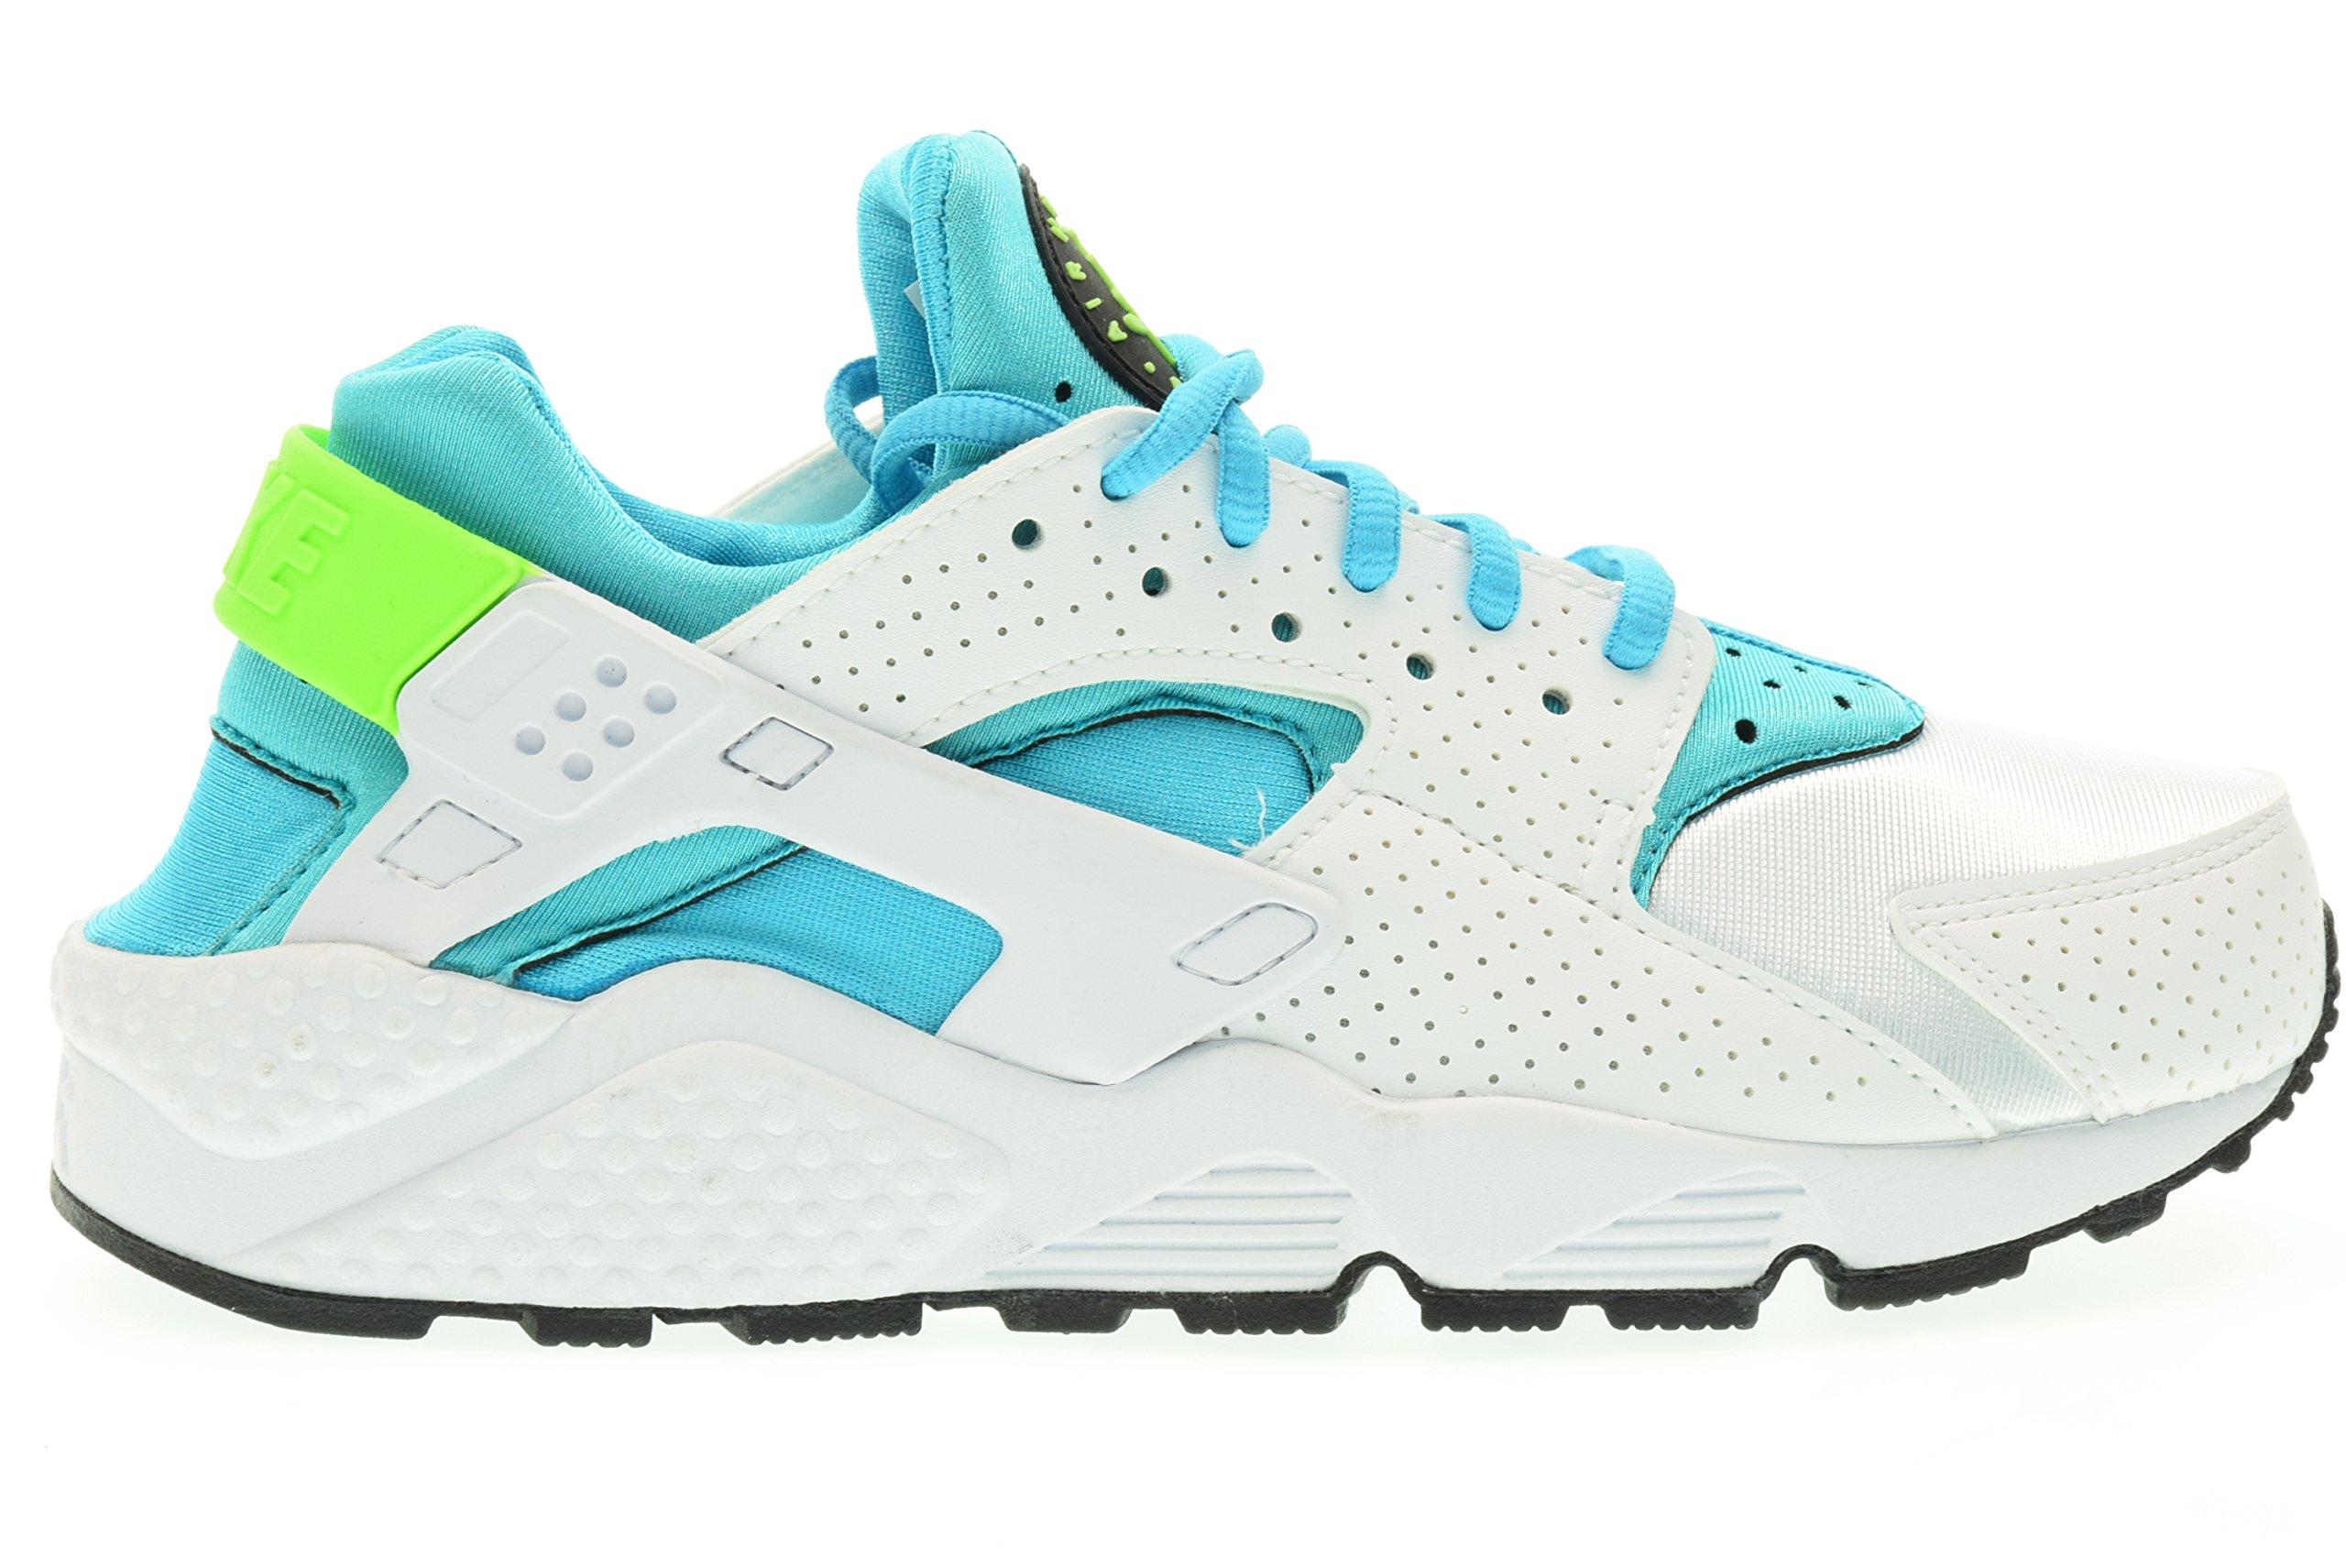 f70193bd88717 Galleon - Nike Womens Air Huarache Run Trainers 634835 Sneakers Shoes (US  6.5